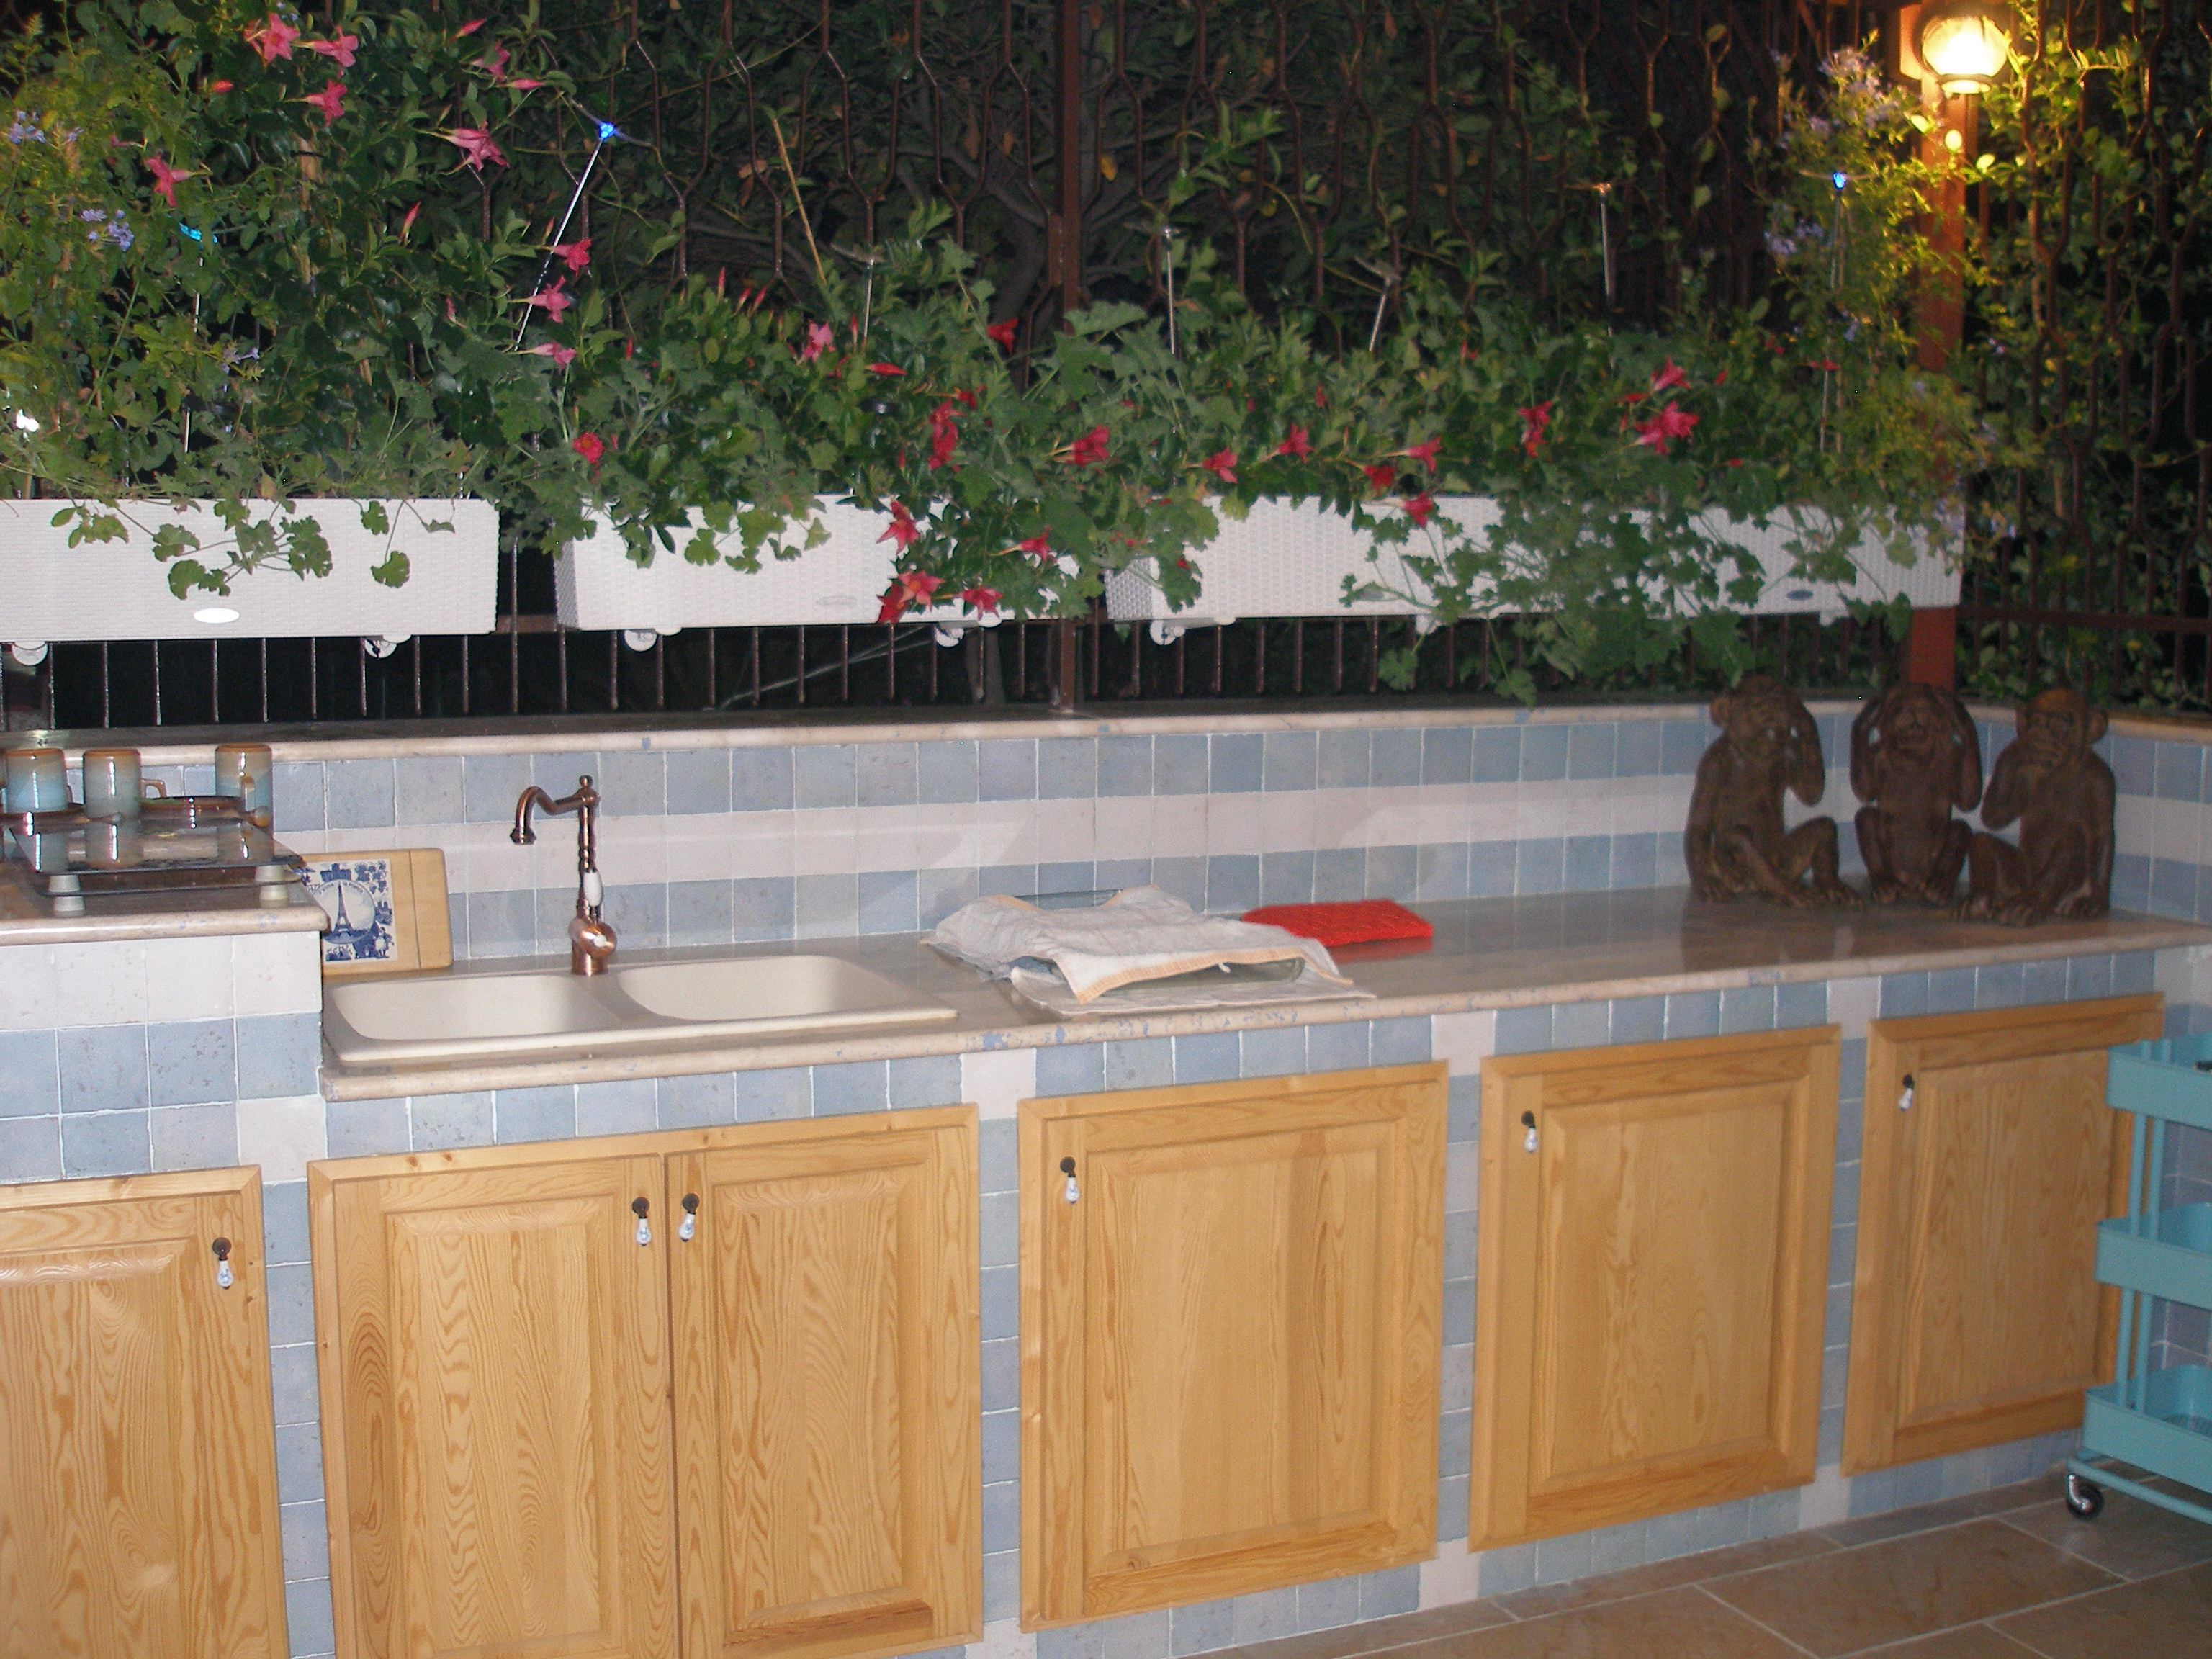 Copertura a due falde con lucernari - Cucine in muratura giardino ...